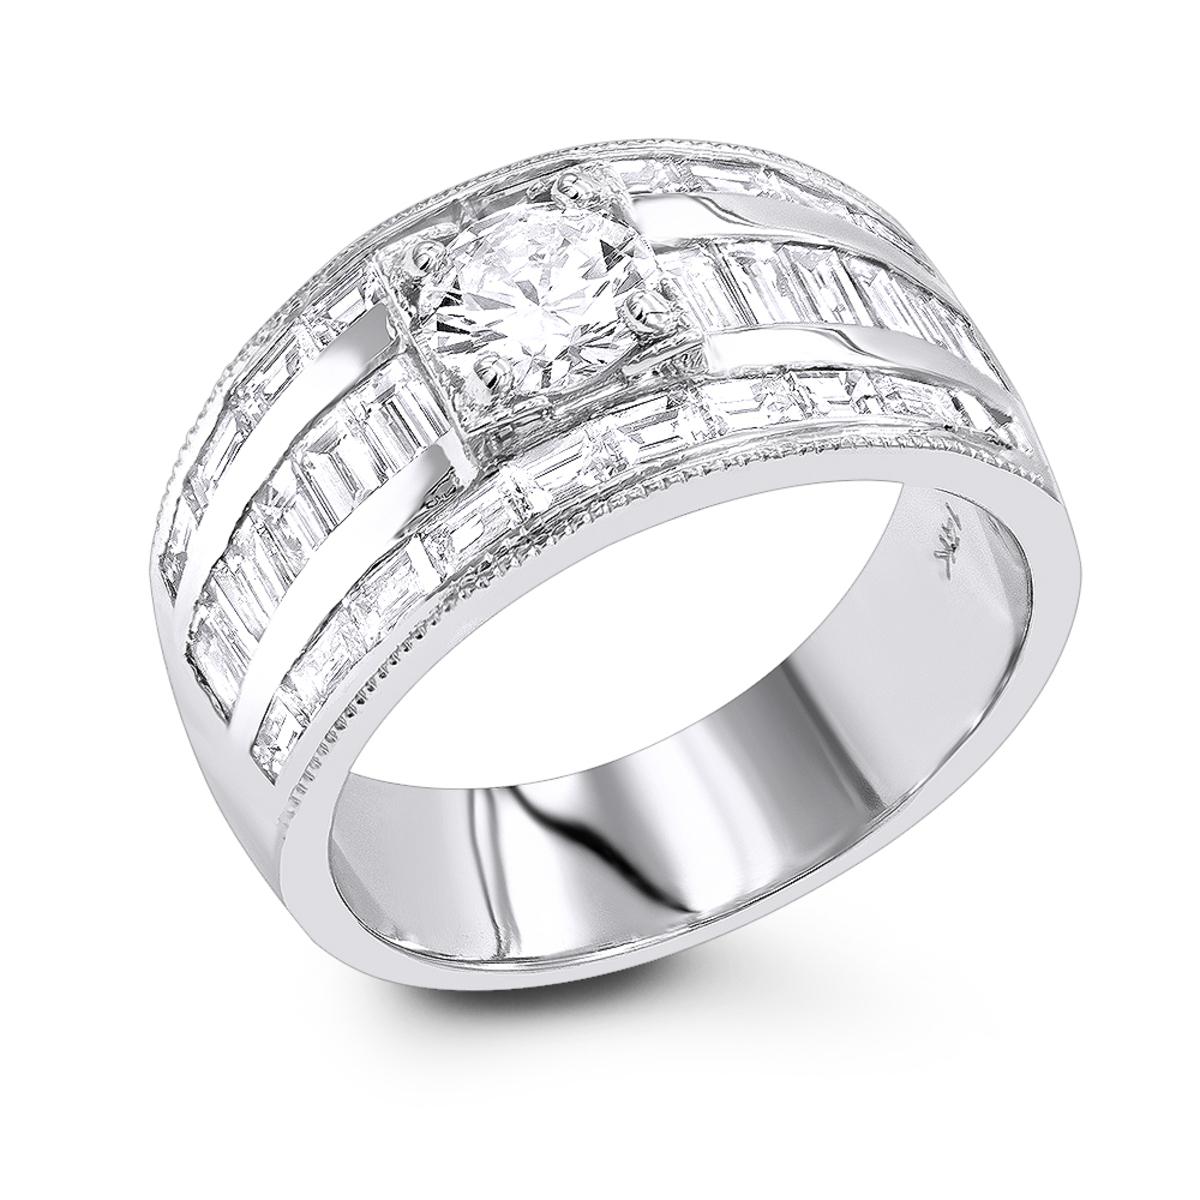 Unique 14K Gold Baguette & Round Diamond Engagement Ring 2.75ct by Luxurman